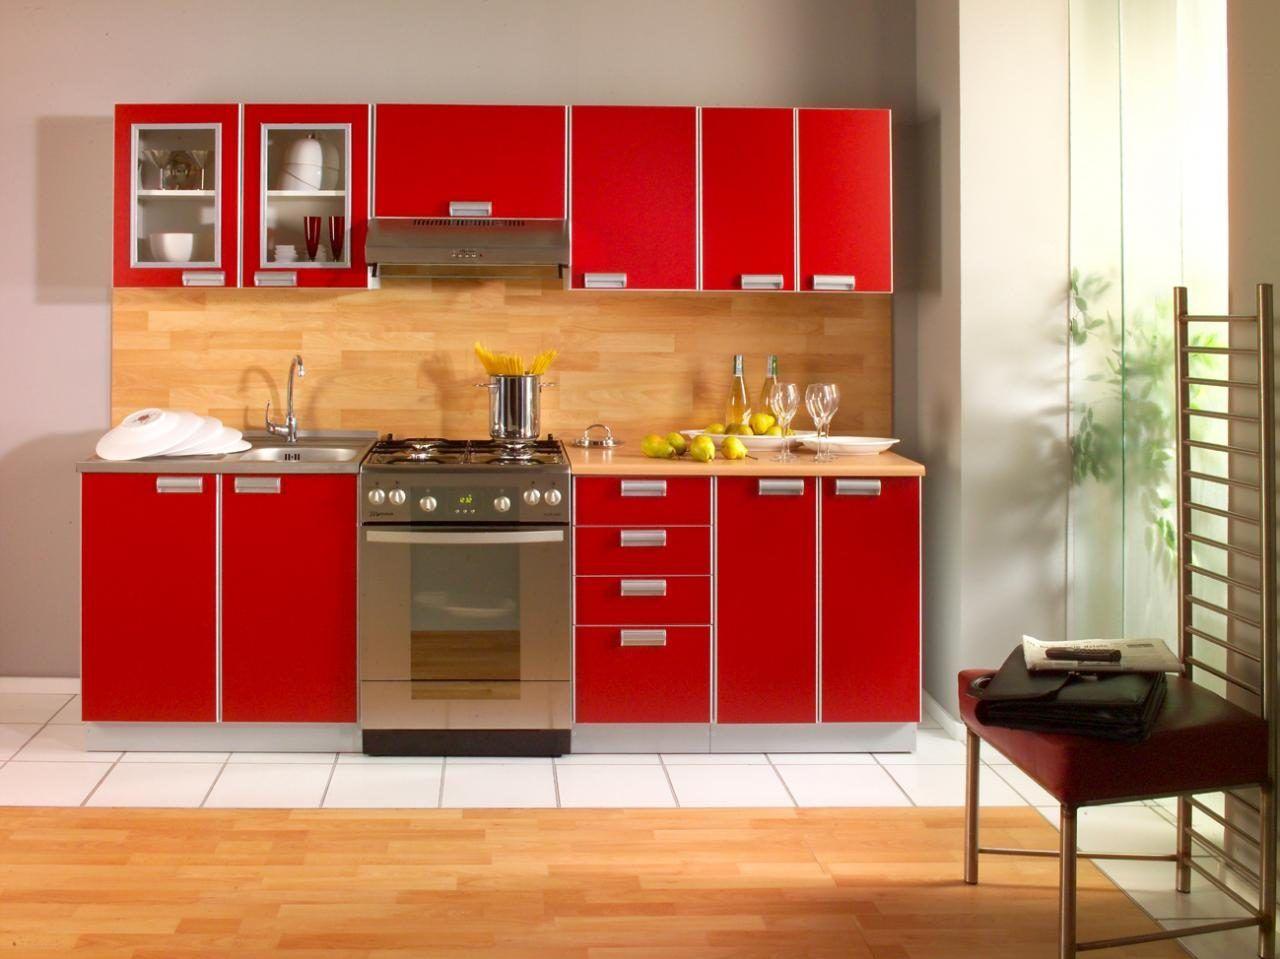 mueble cocina rojo inspiracin de diseo de interiores